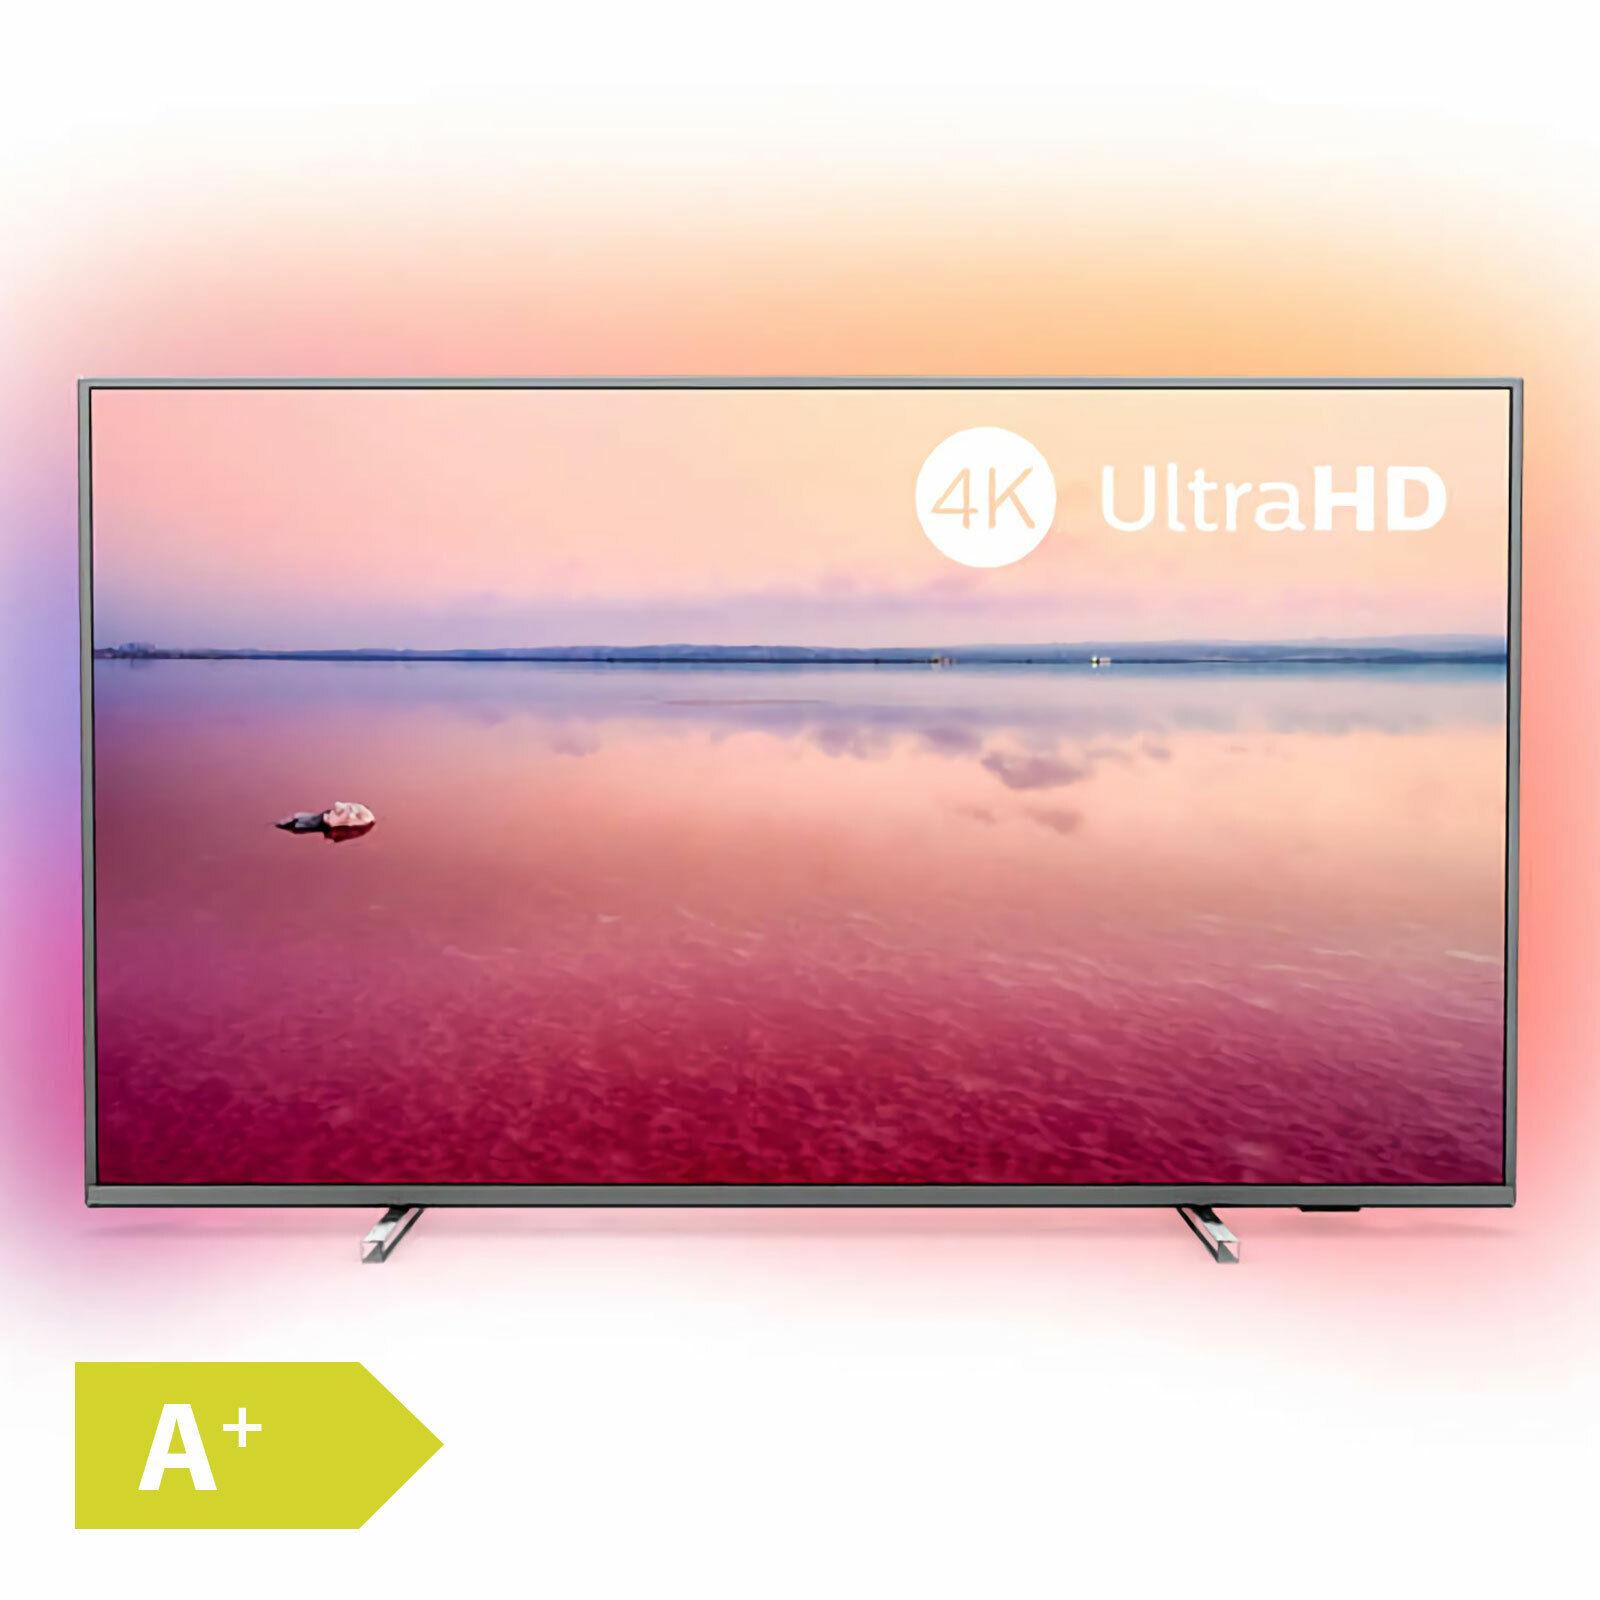 Philips 126cm 50 Zoll Ultra HD 4K LED Fernseher Ambilight HDR Smart TV PVR